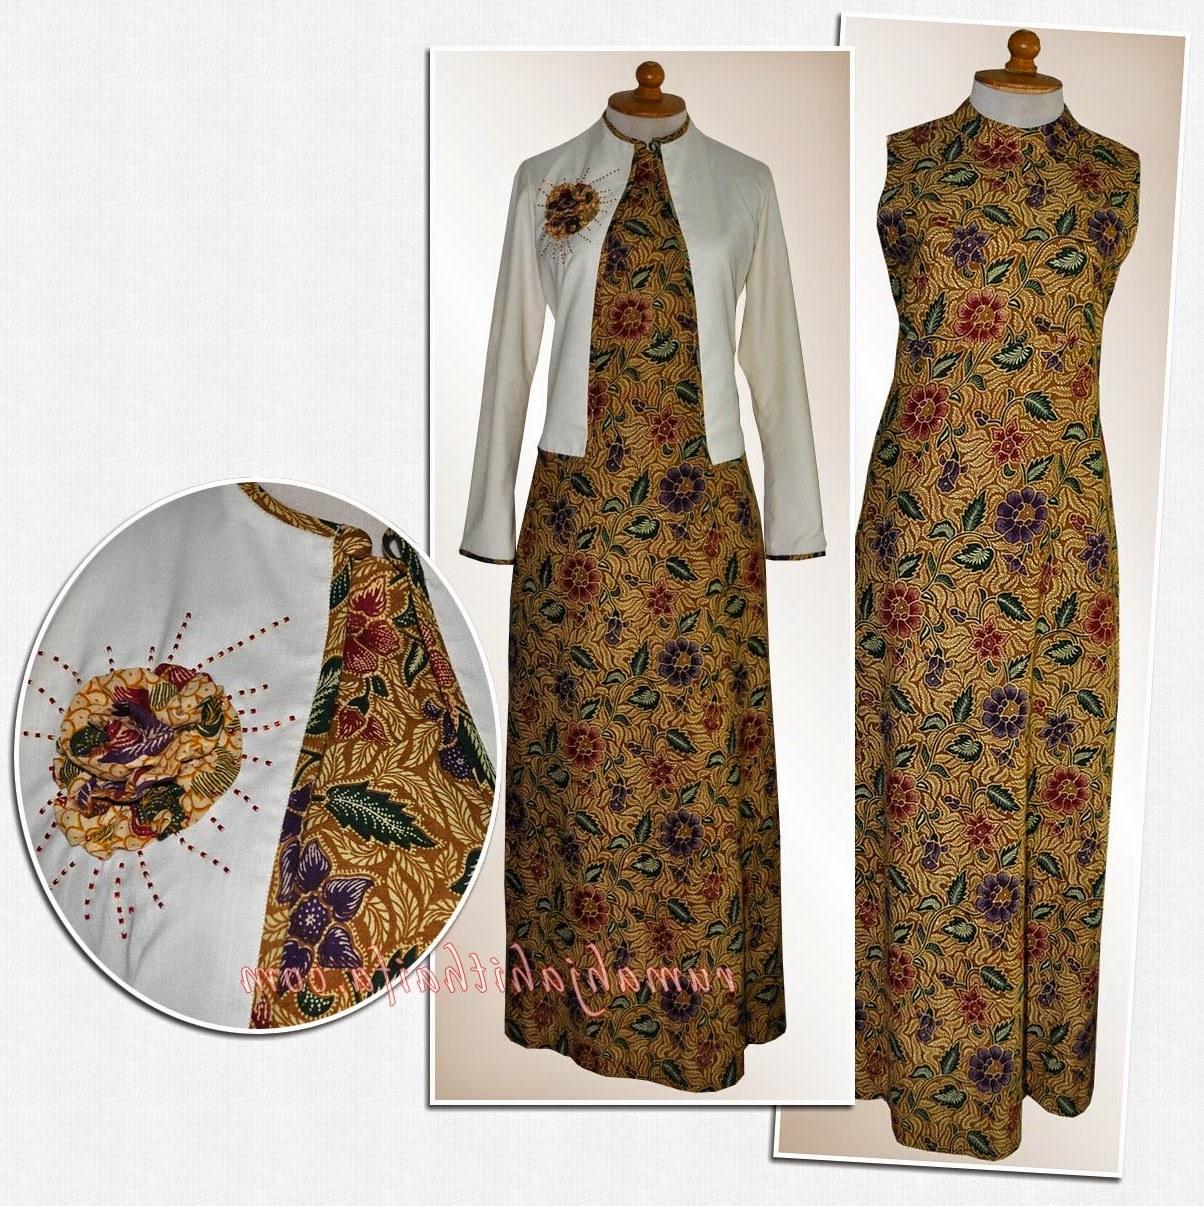 Inspirasi Baju Lebaran Batik Rldj 10 Model Baju Batik Lebaran Modern Terbaru 2016 Pusat